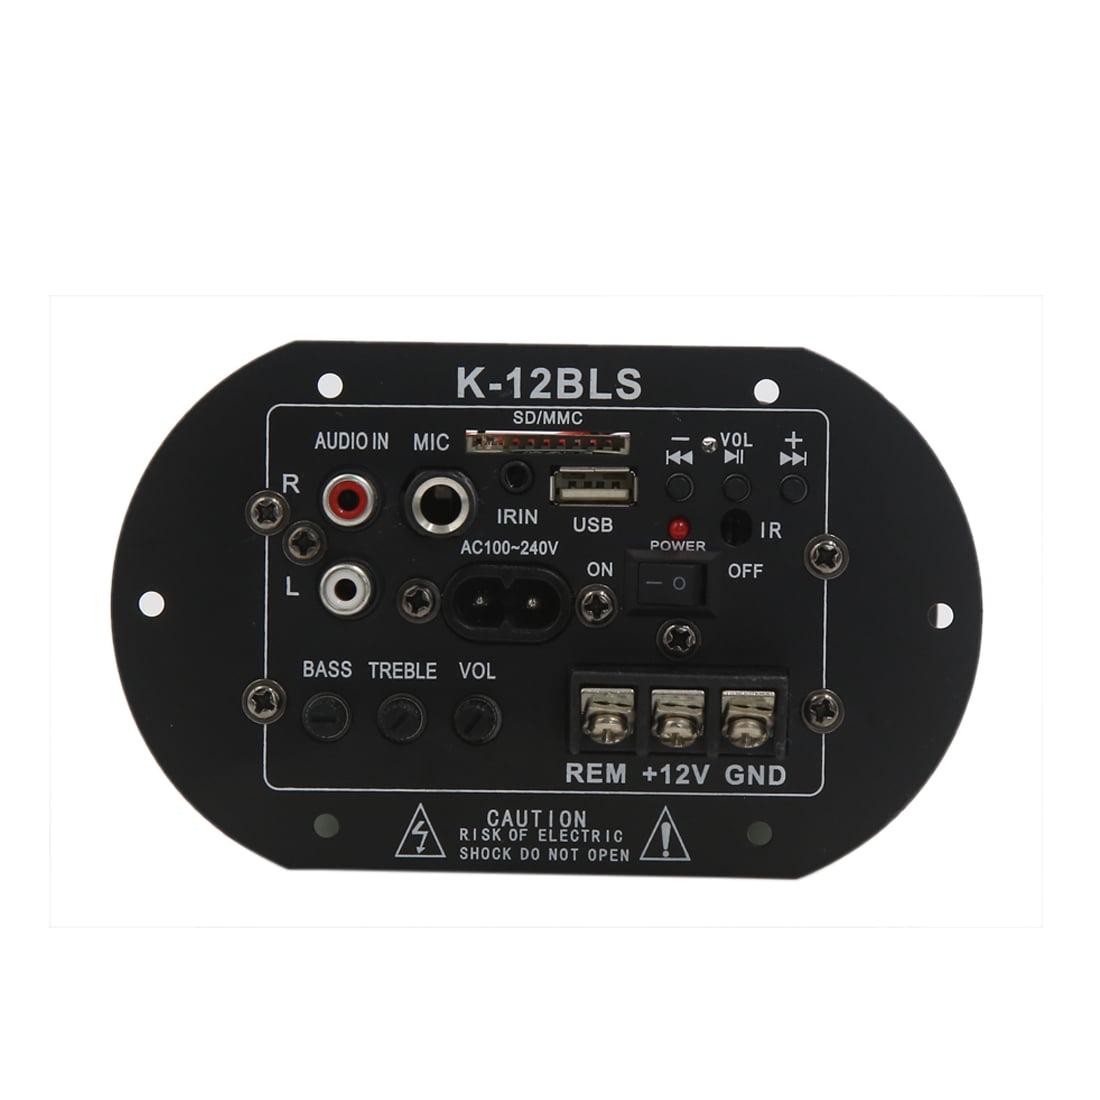 DC 12V Metal Audio Stereo Power Amplifier Board Module for Car Automobile - image 4 de 4